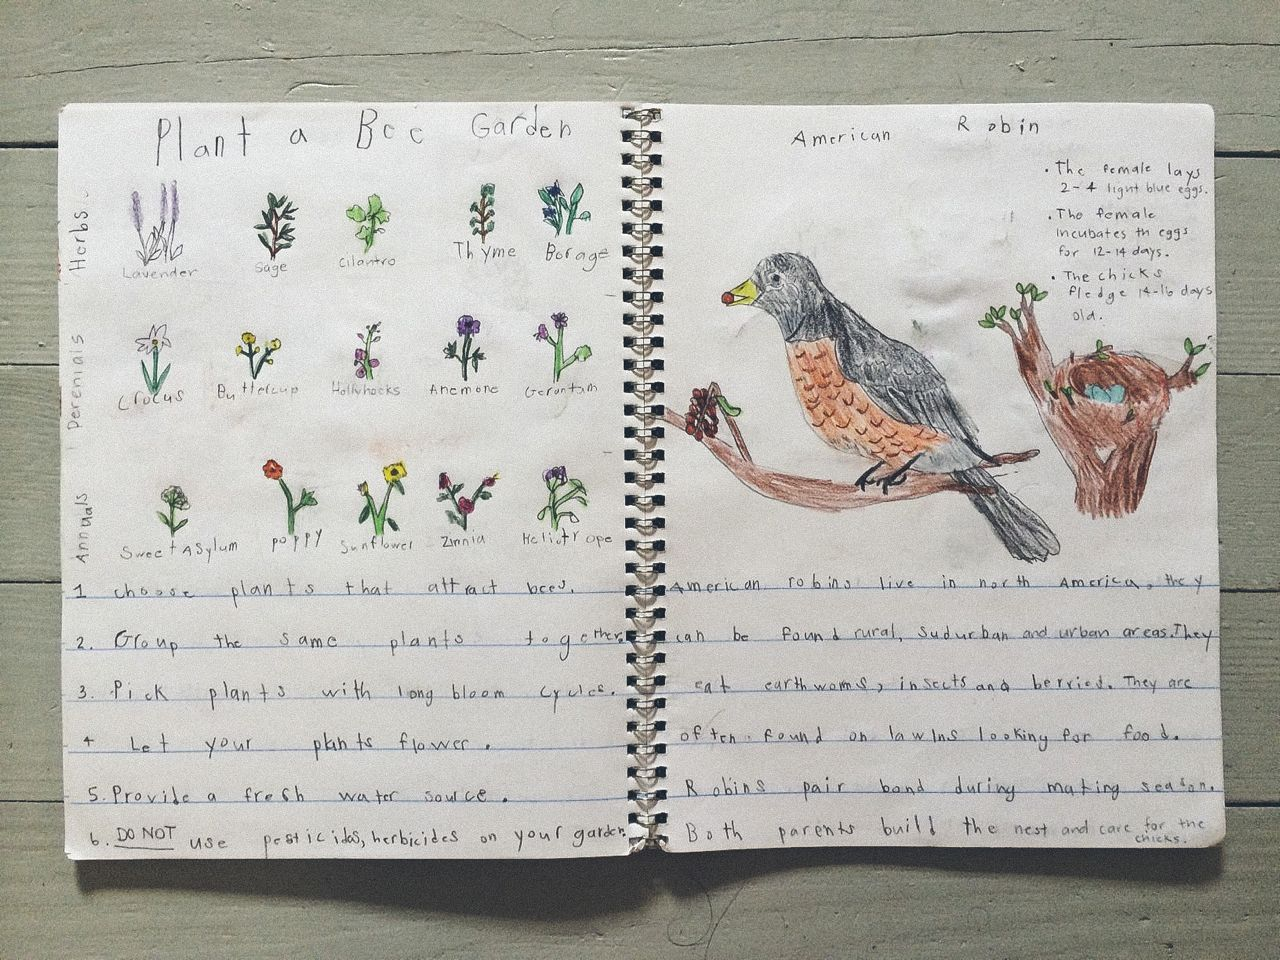 Pollinator Plants & American Robin